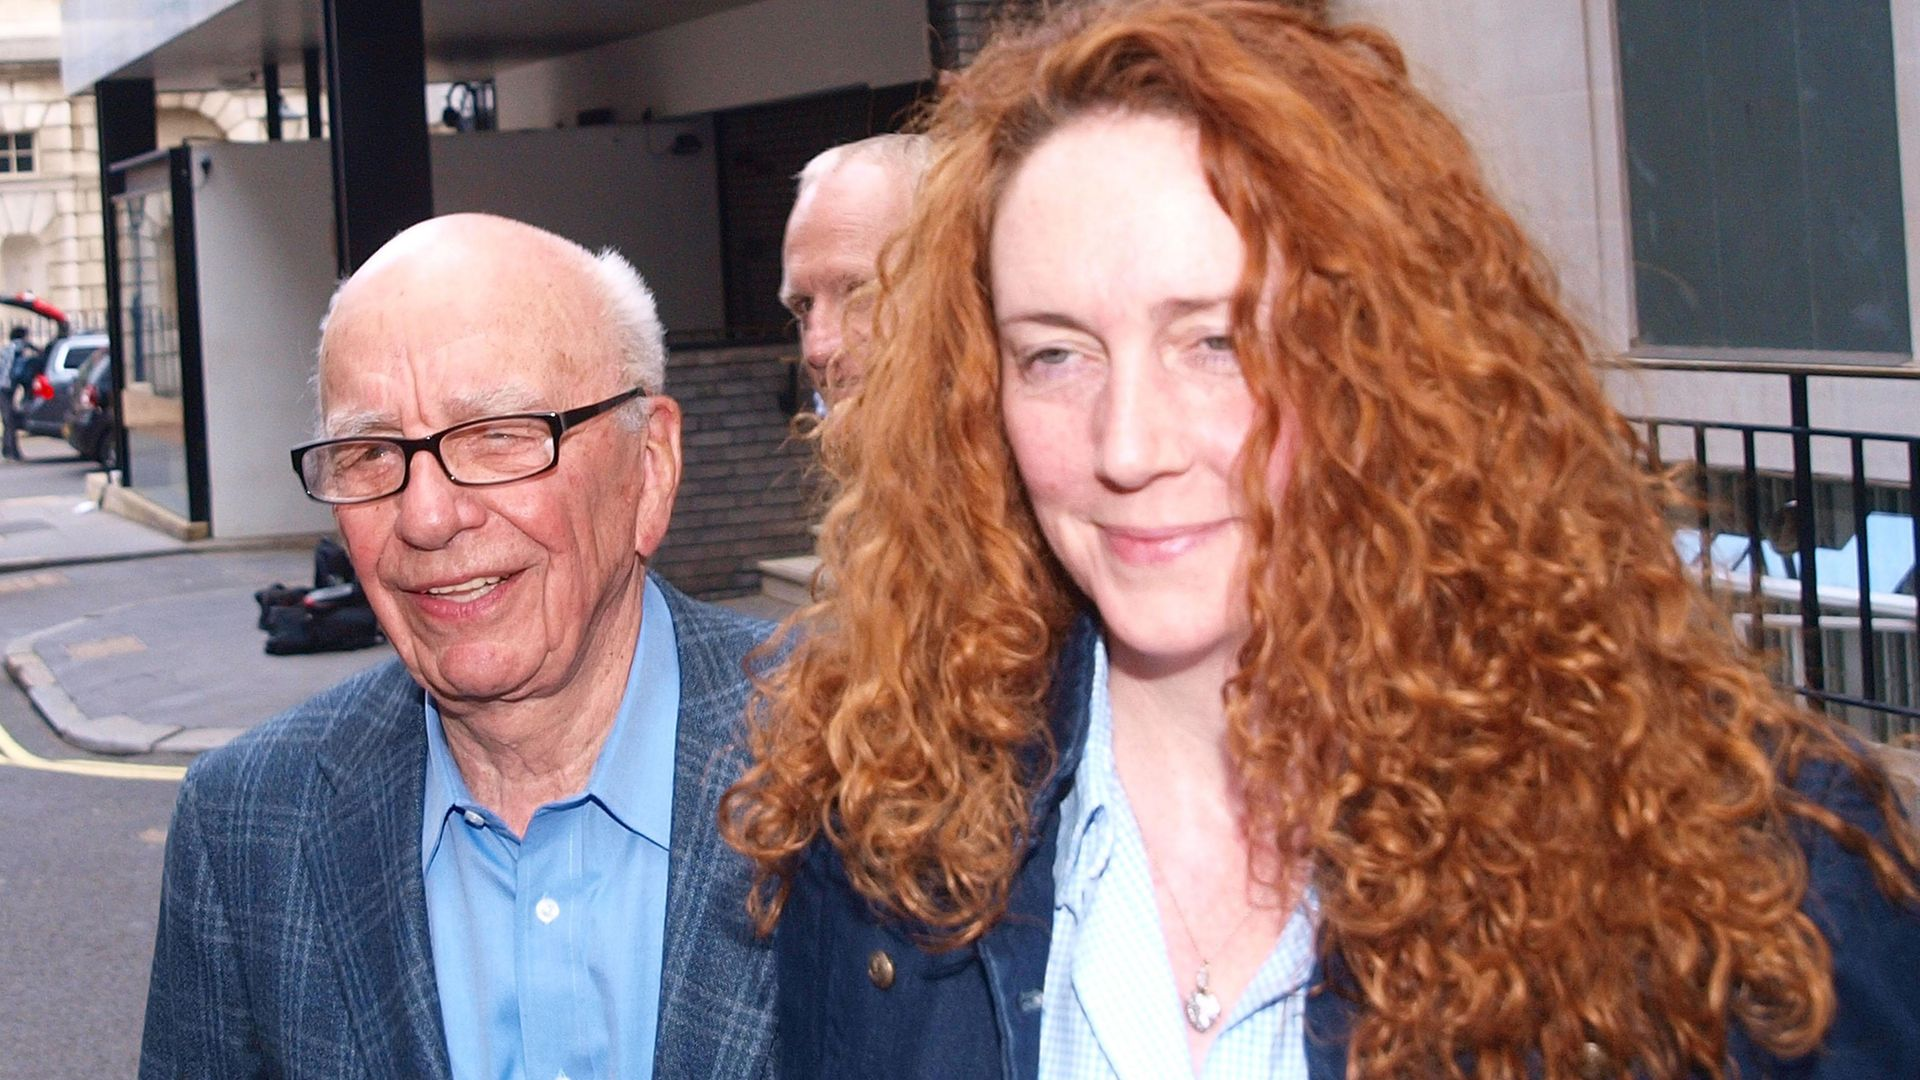 News International chief executive Rebekah Brooks and Rupert Murdoch are seen outside Murdoch's London flat. - Credit: PA